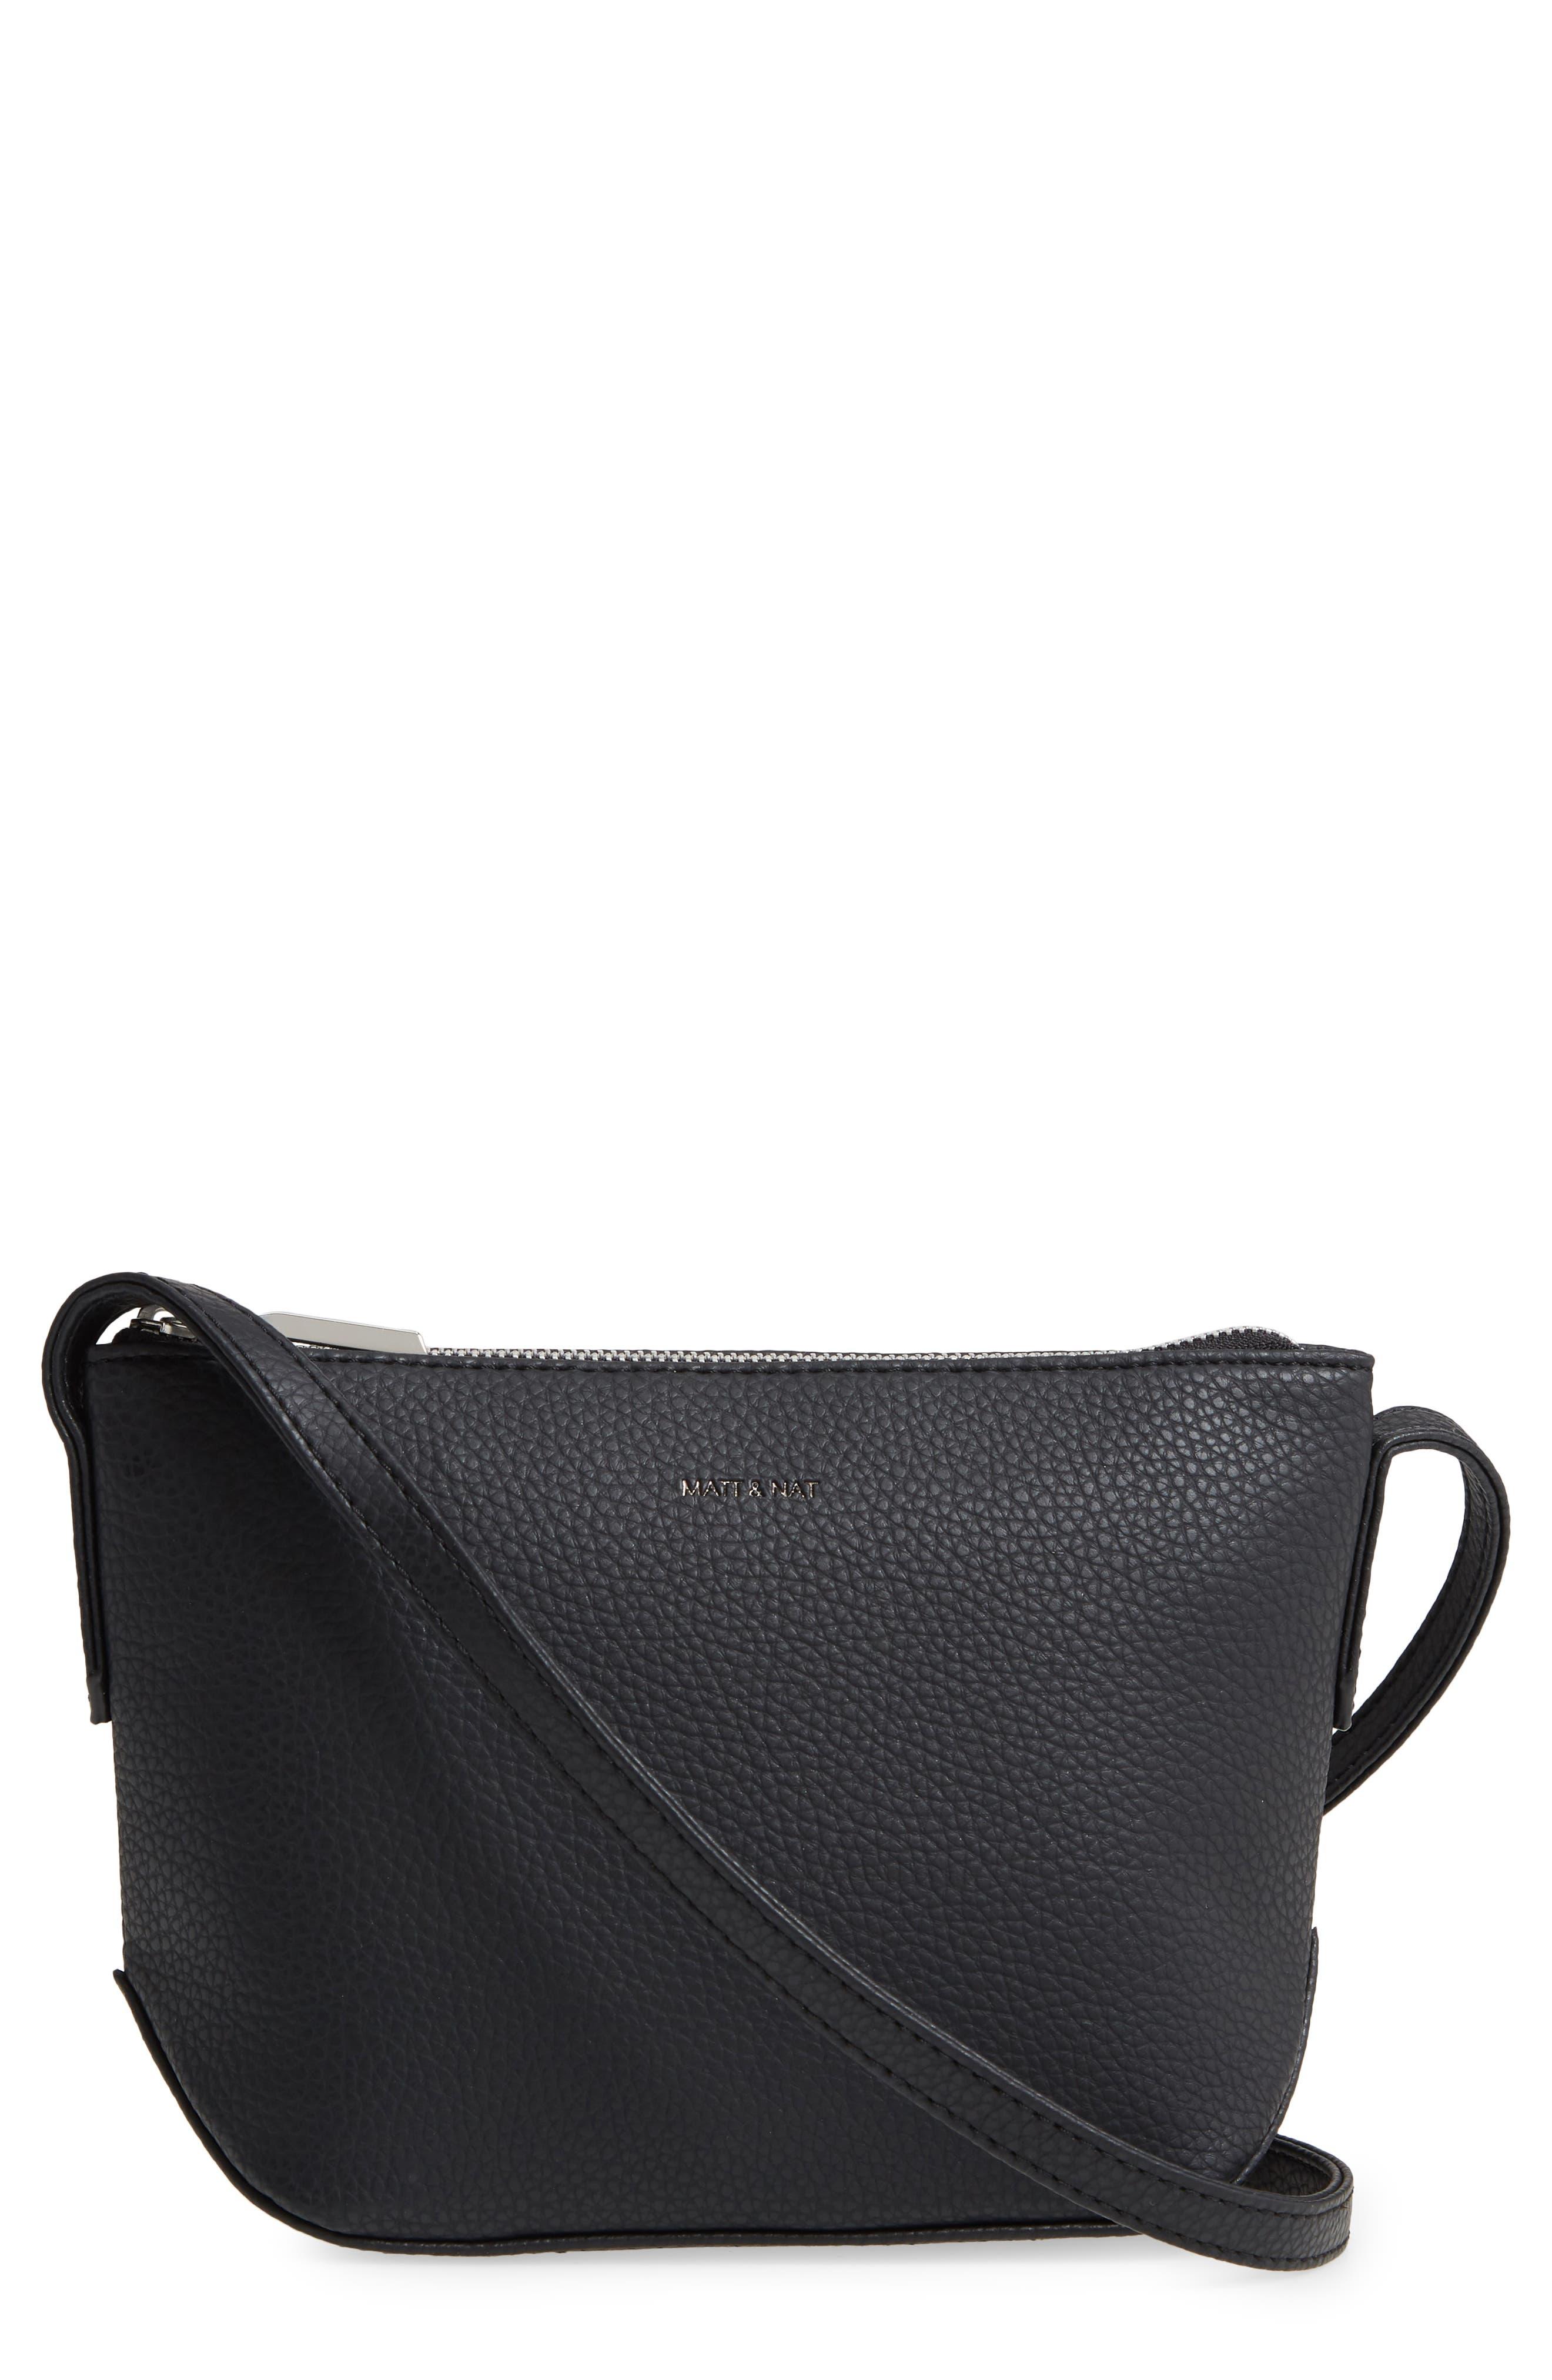 Sam Vegan Leather Crossbody Bag